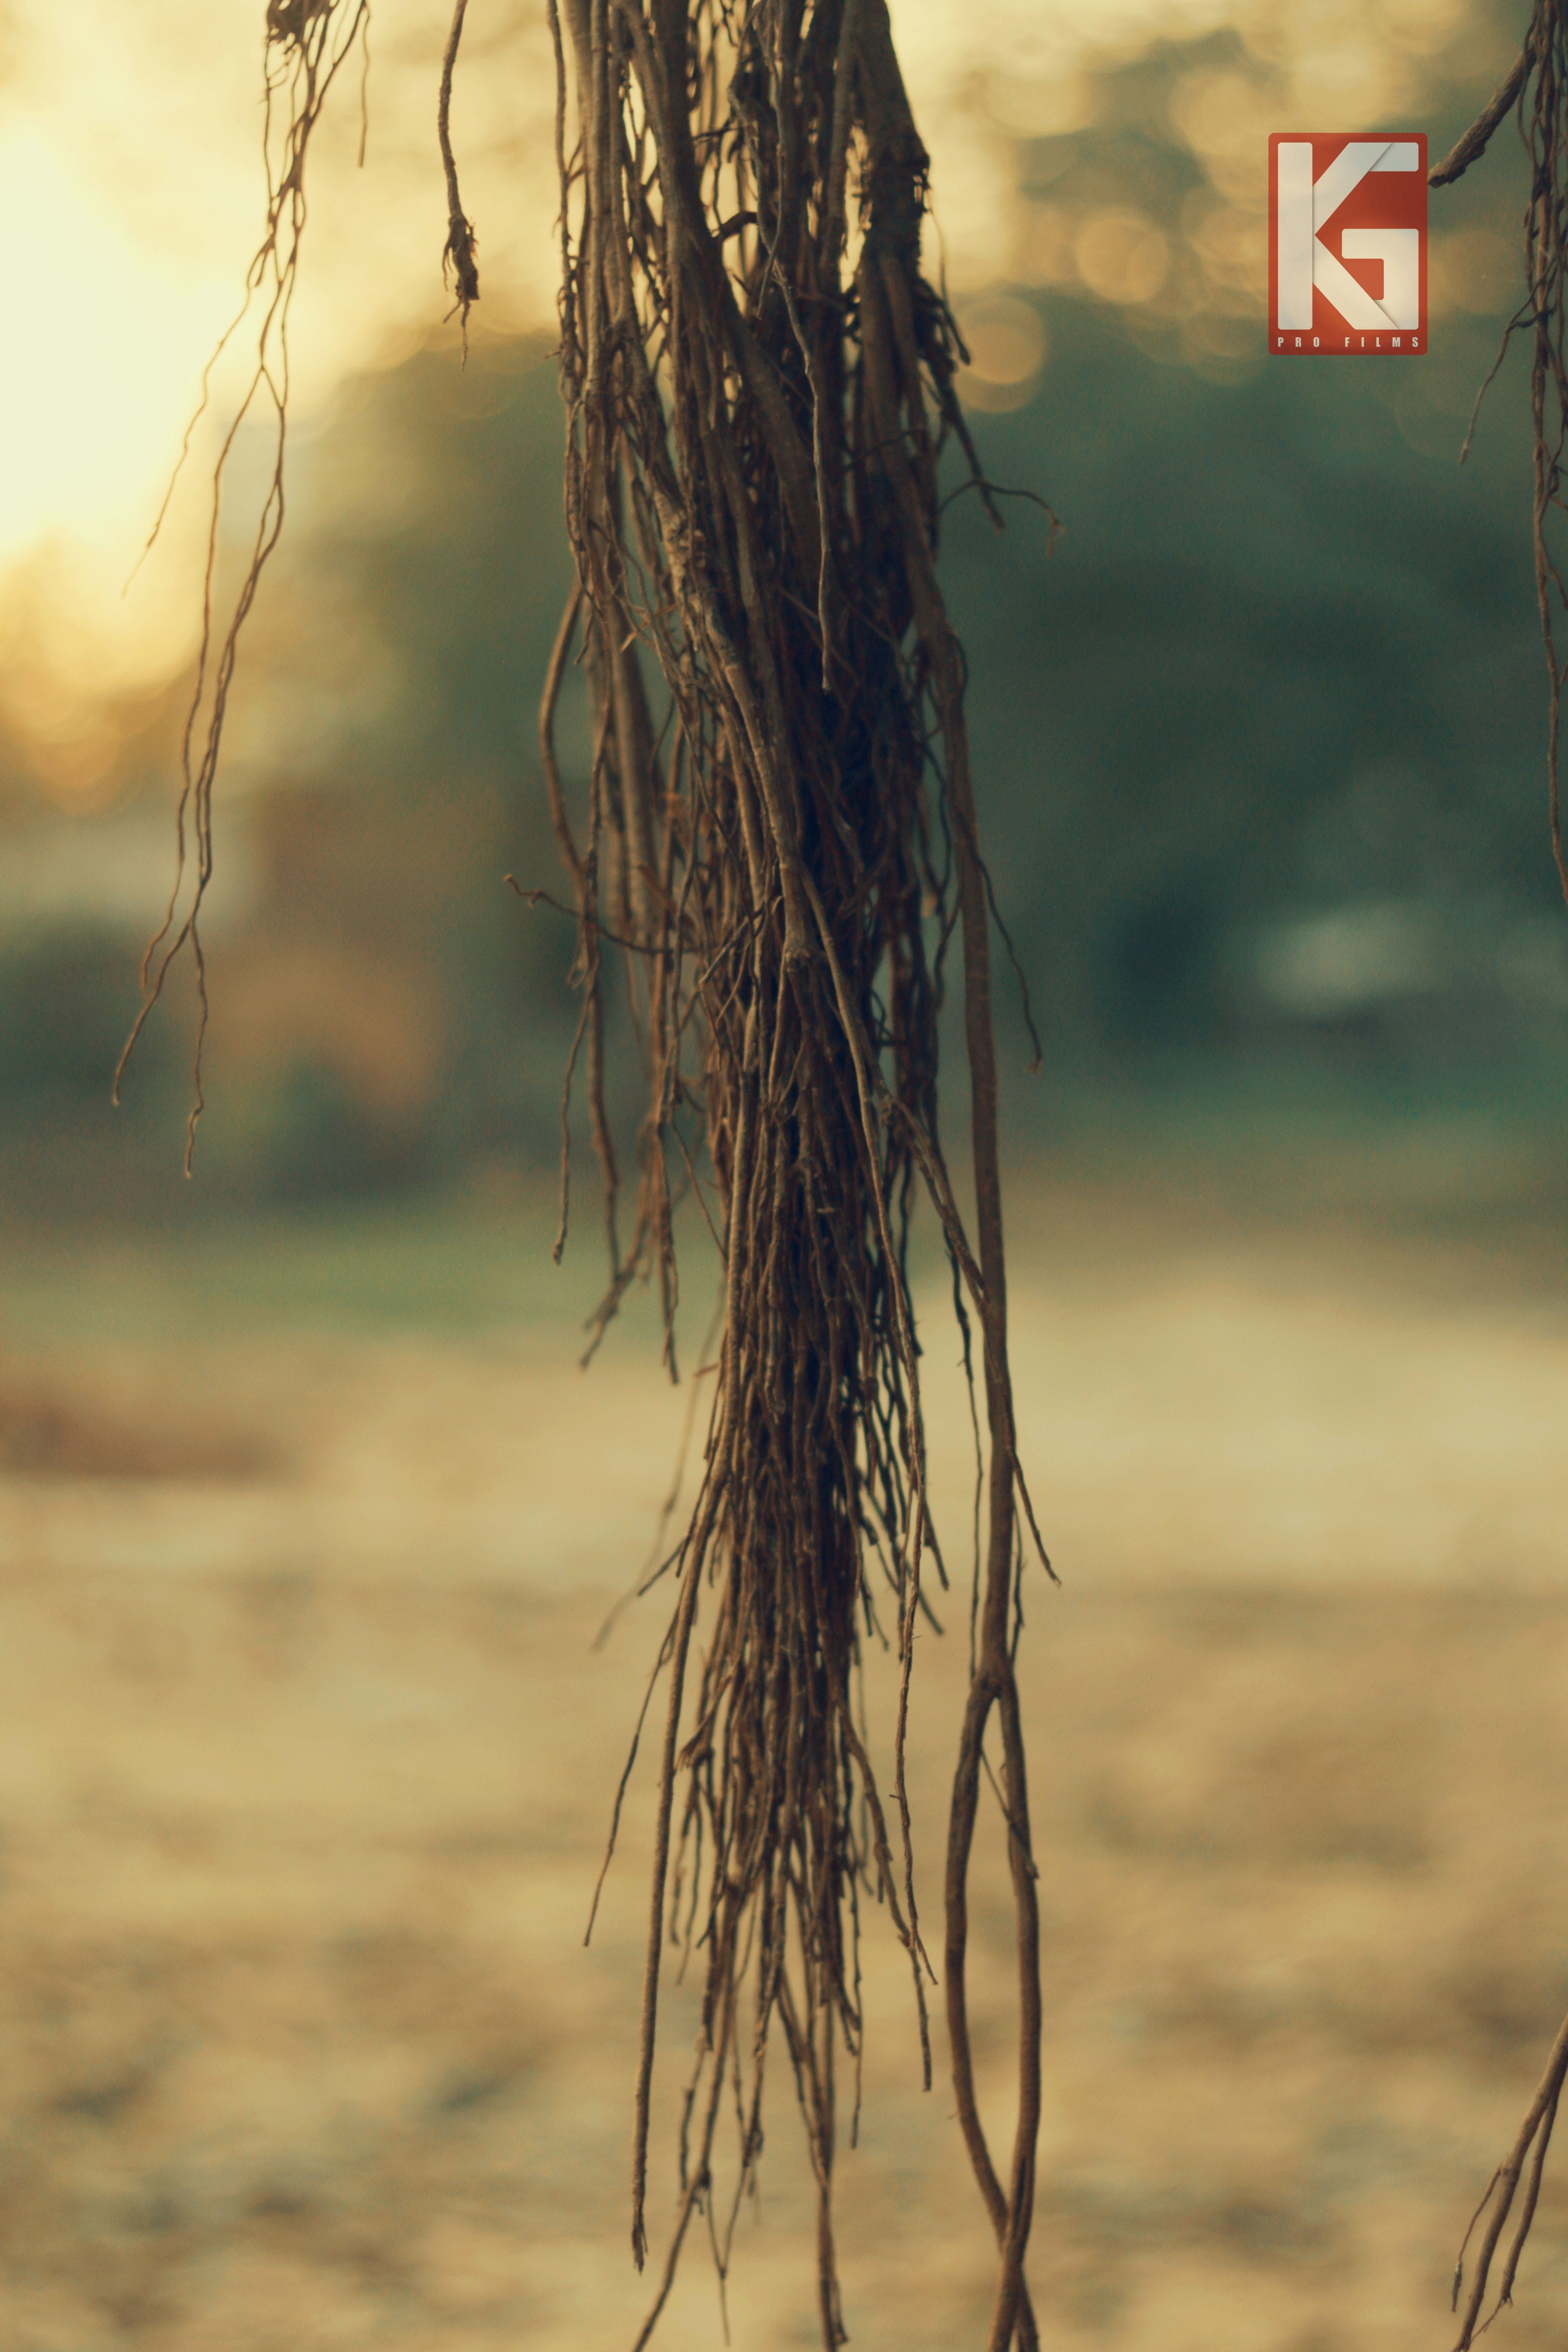 Free stock photo of banyan tree, tree